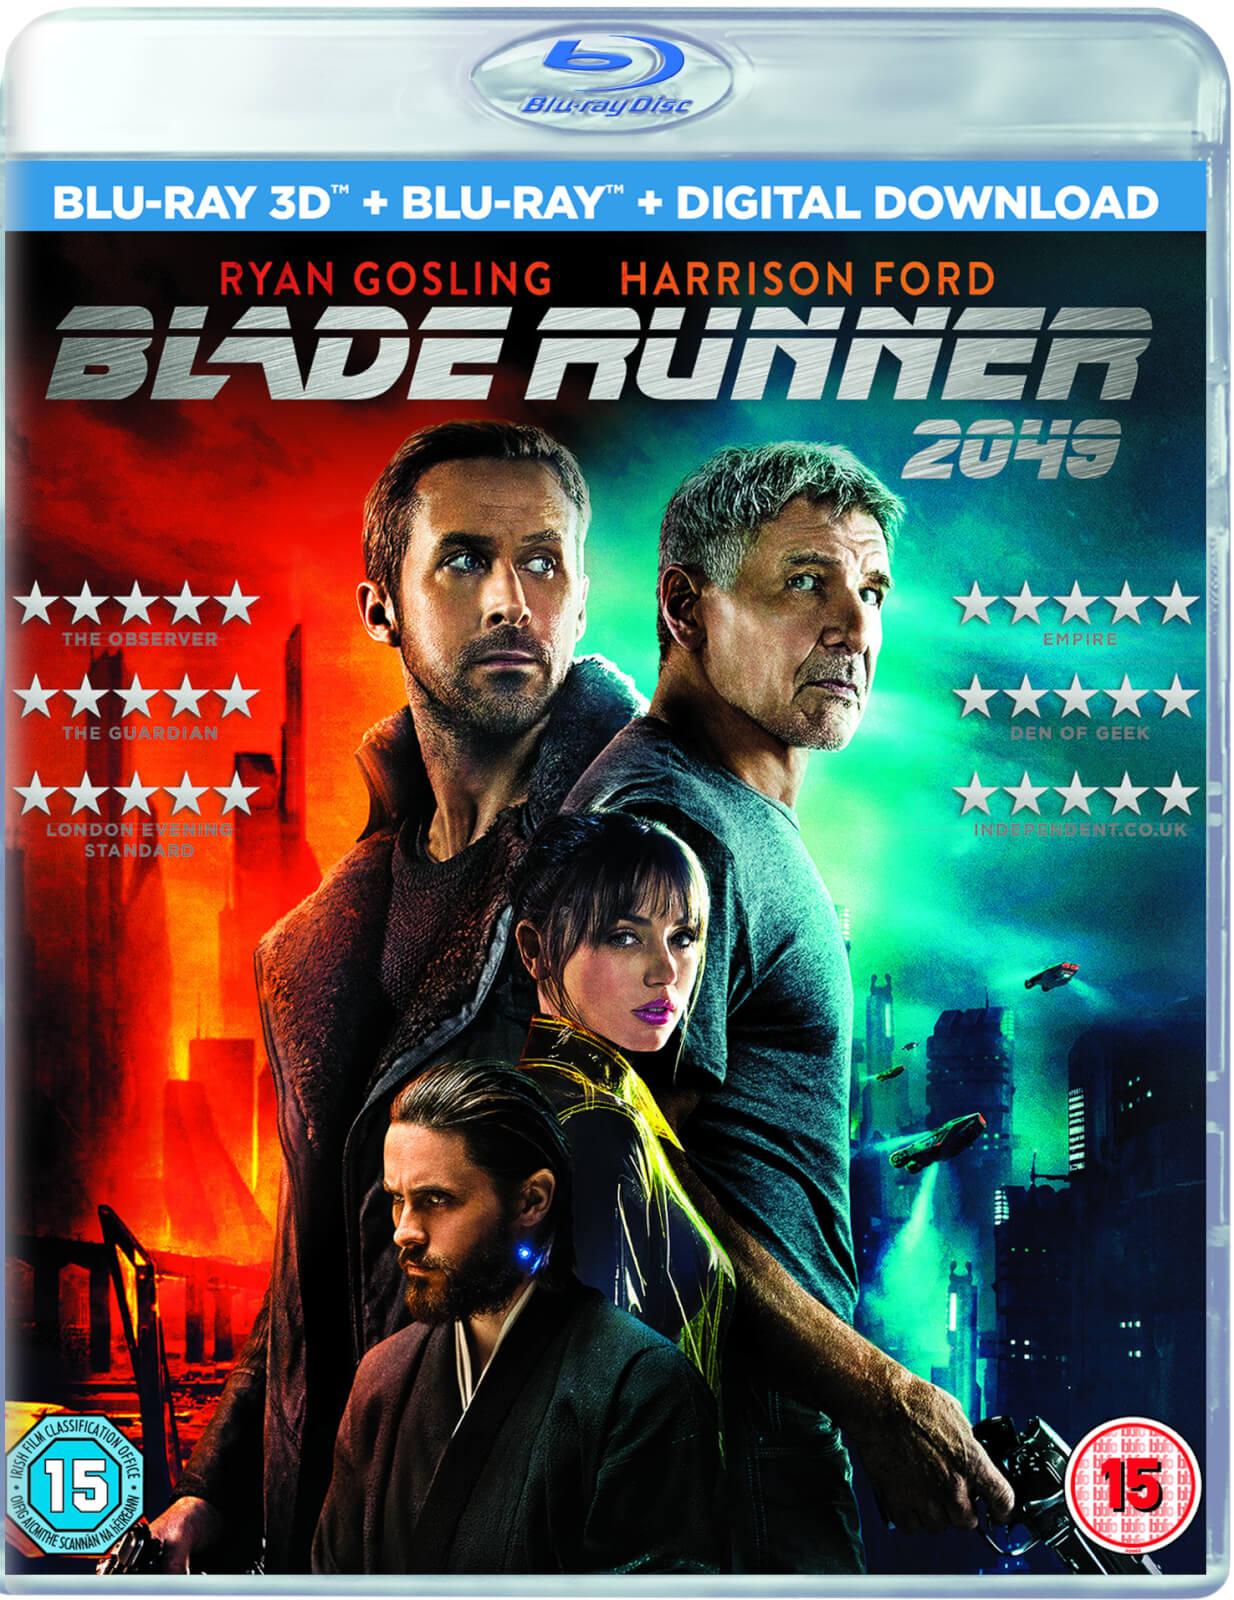 Blade Runner 2049 - Blu-ray 3D + Blu-ray + Digital Download £3.99 HMV instore (Westfield)